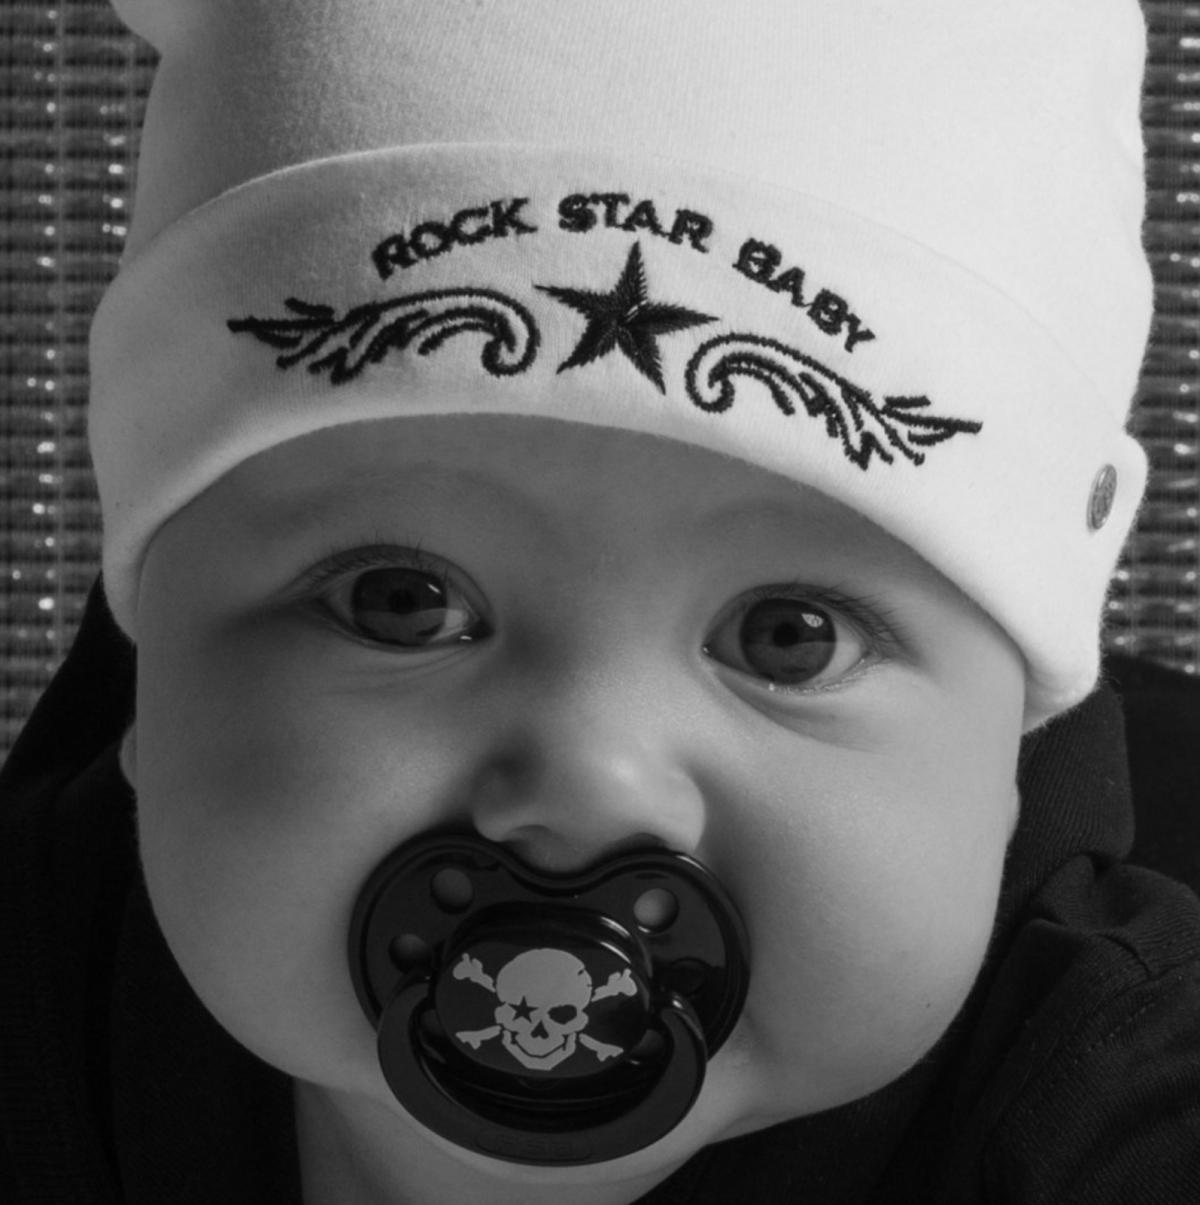 Rock Star Baby 2 Stk Strohhalmbecher Trinkbecher 340 ml Pirat